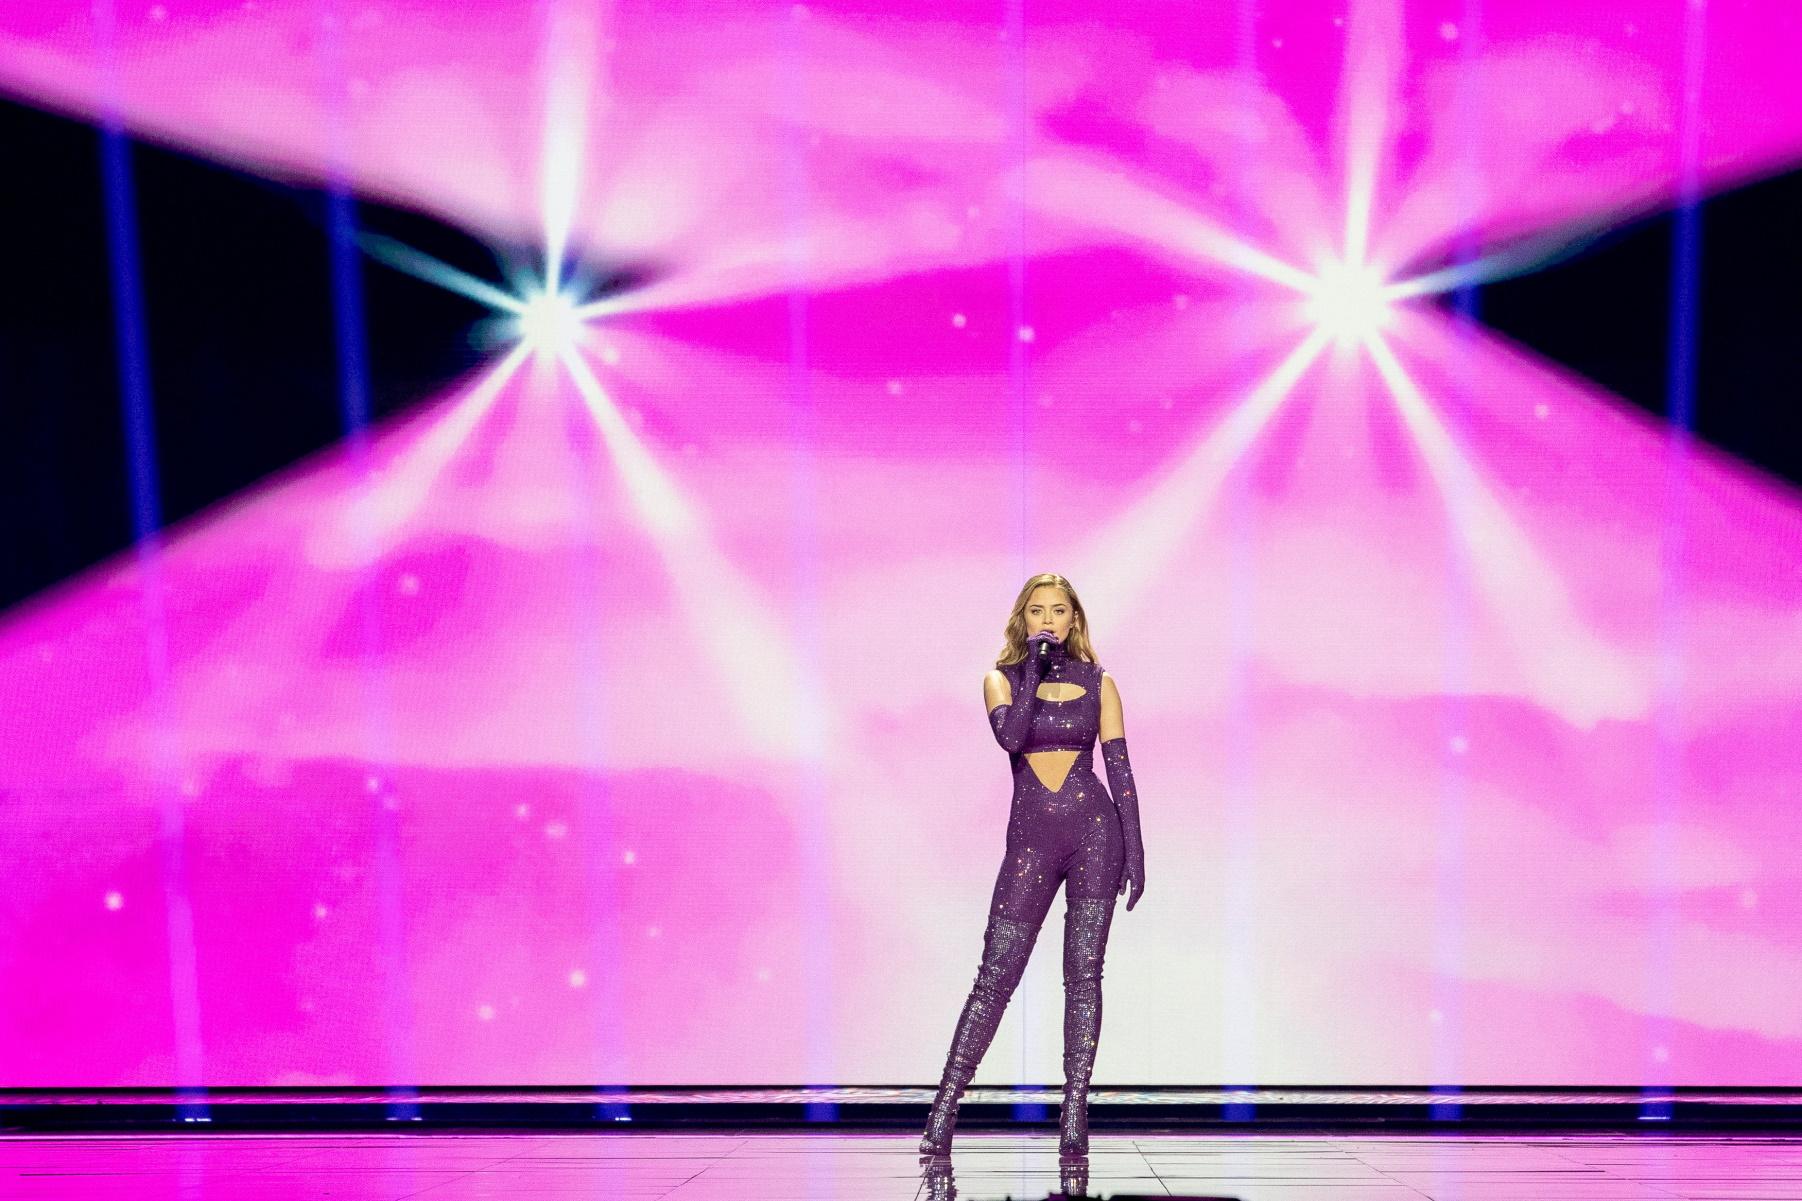 Eurovision 2021: Έτσι θα δώσουν τη μάχη Ελλάδα και Κύπρος